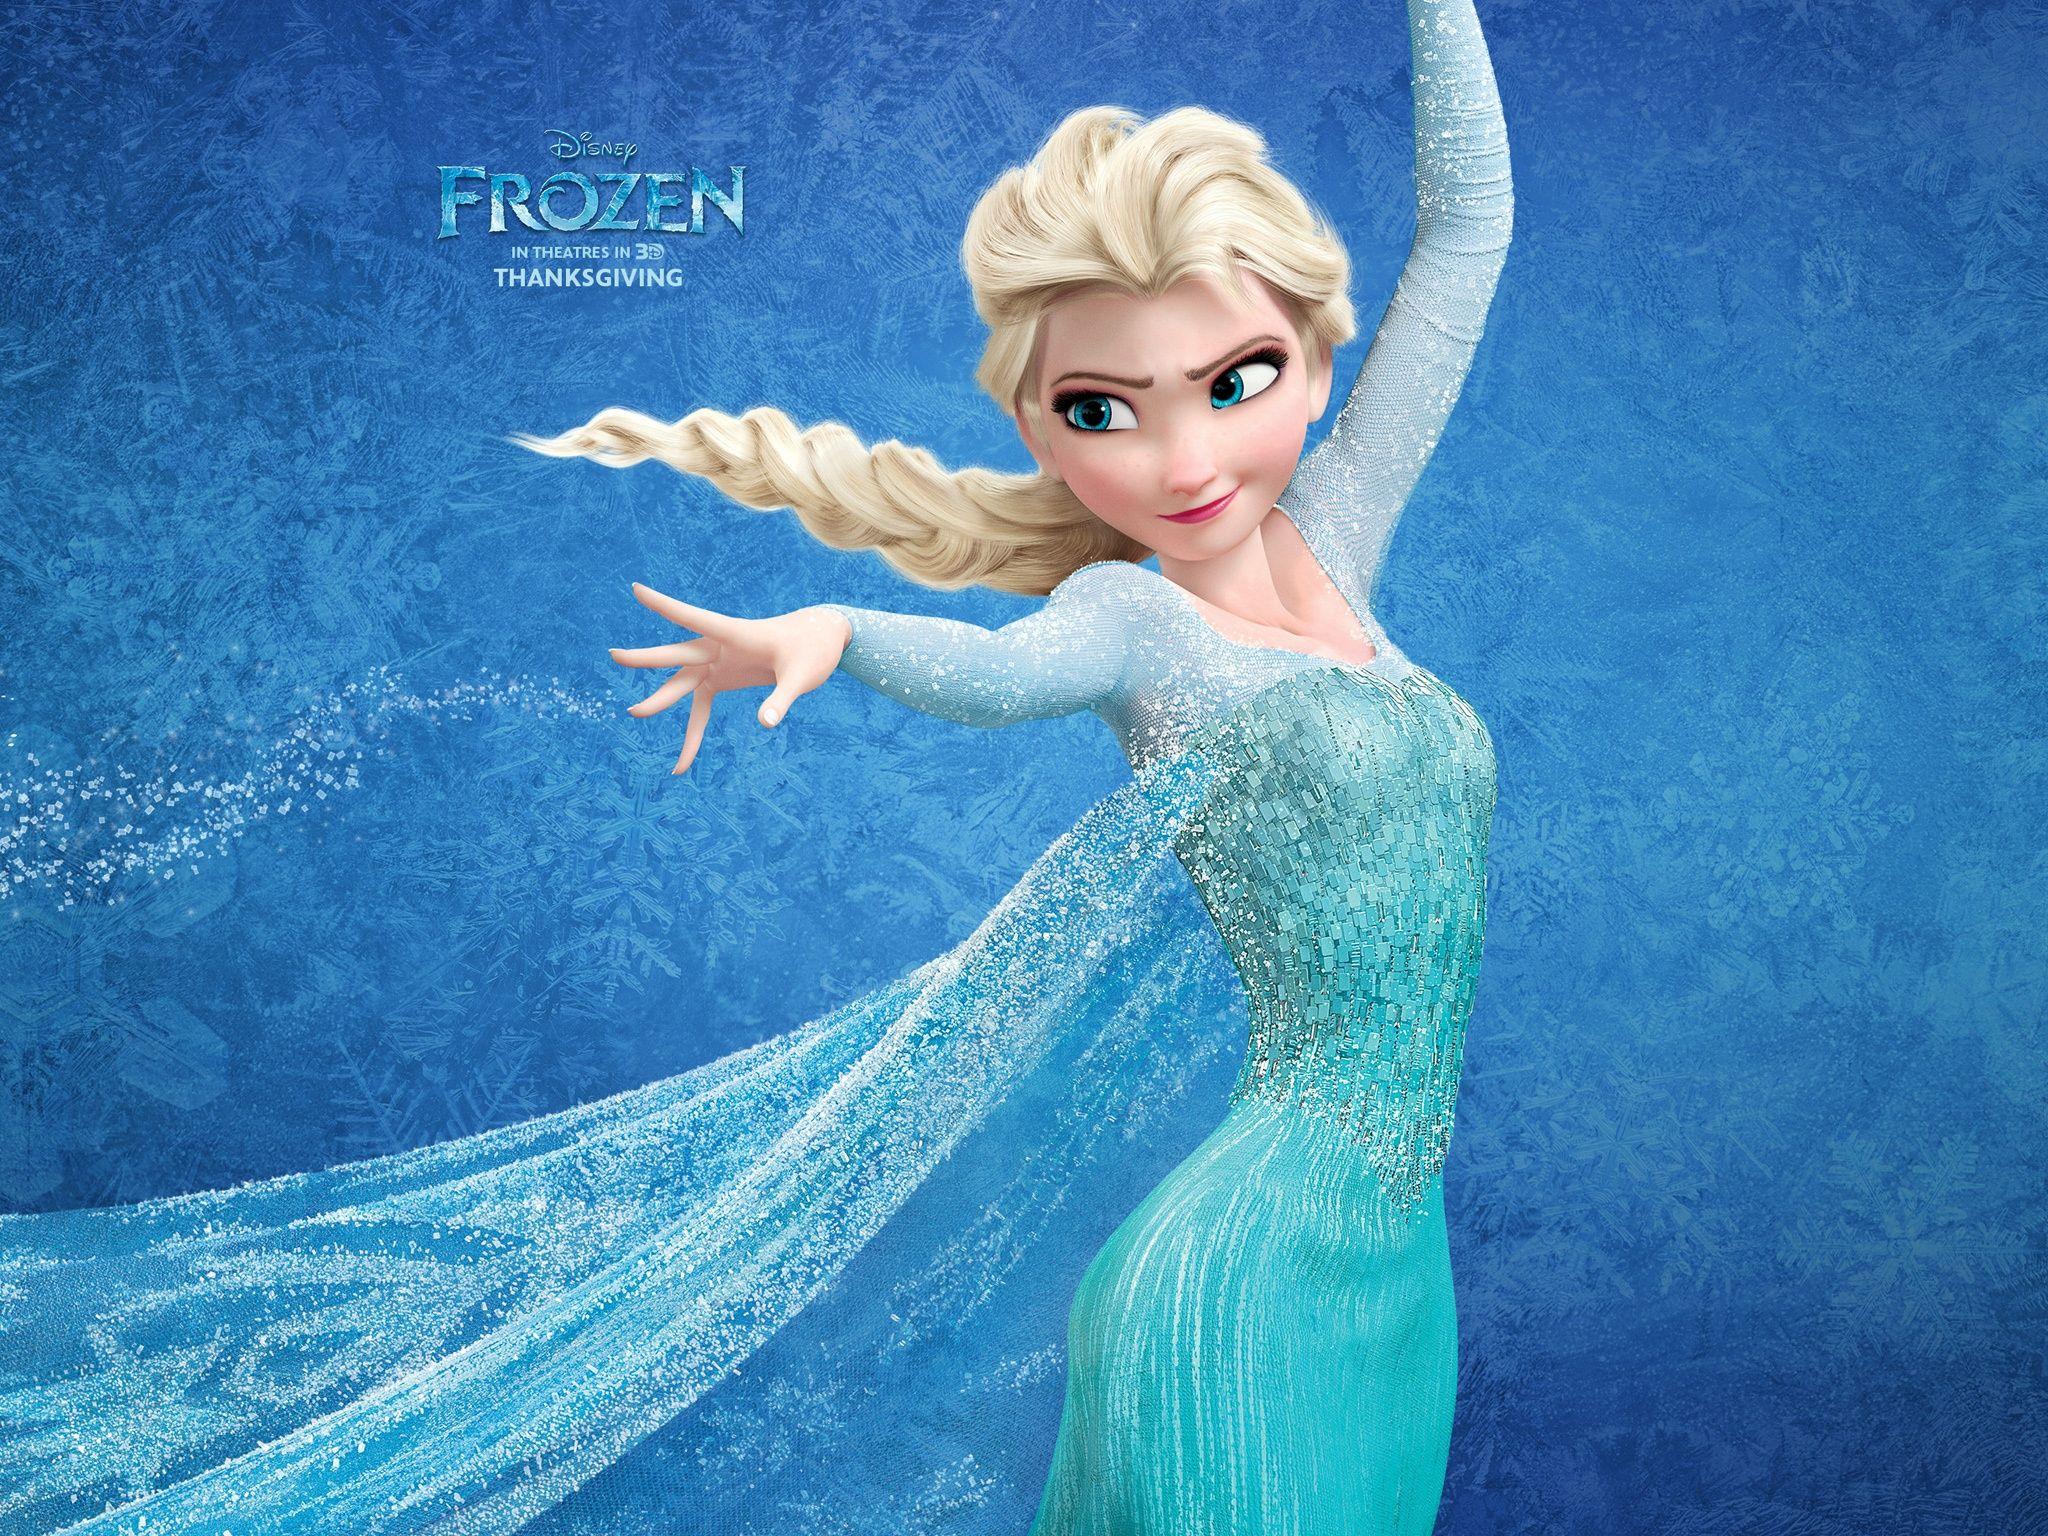 The dress from frozen - The Dress From Frozen 7